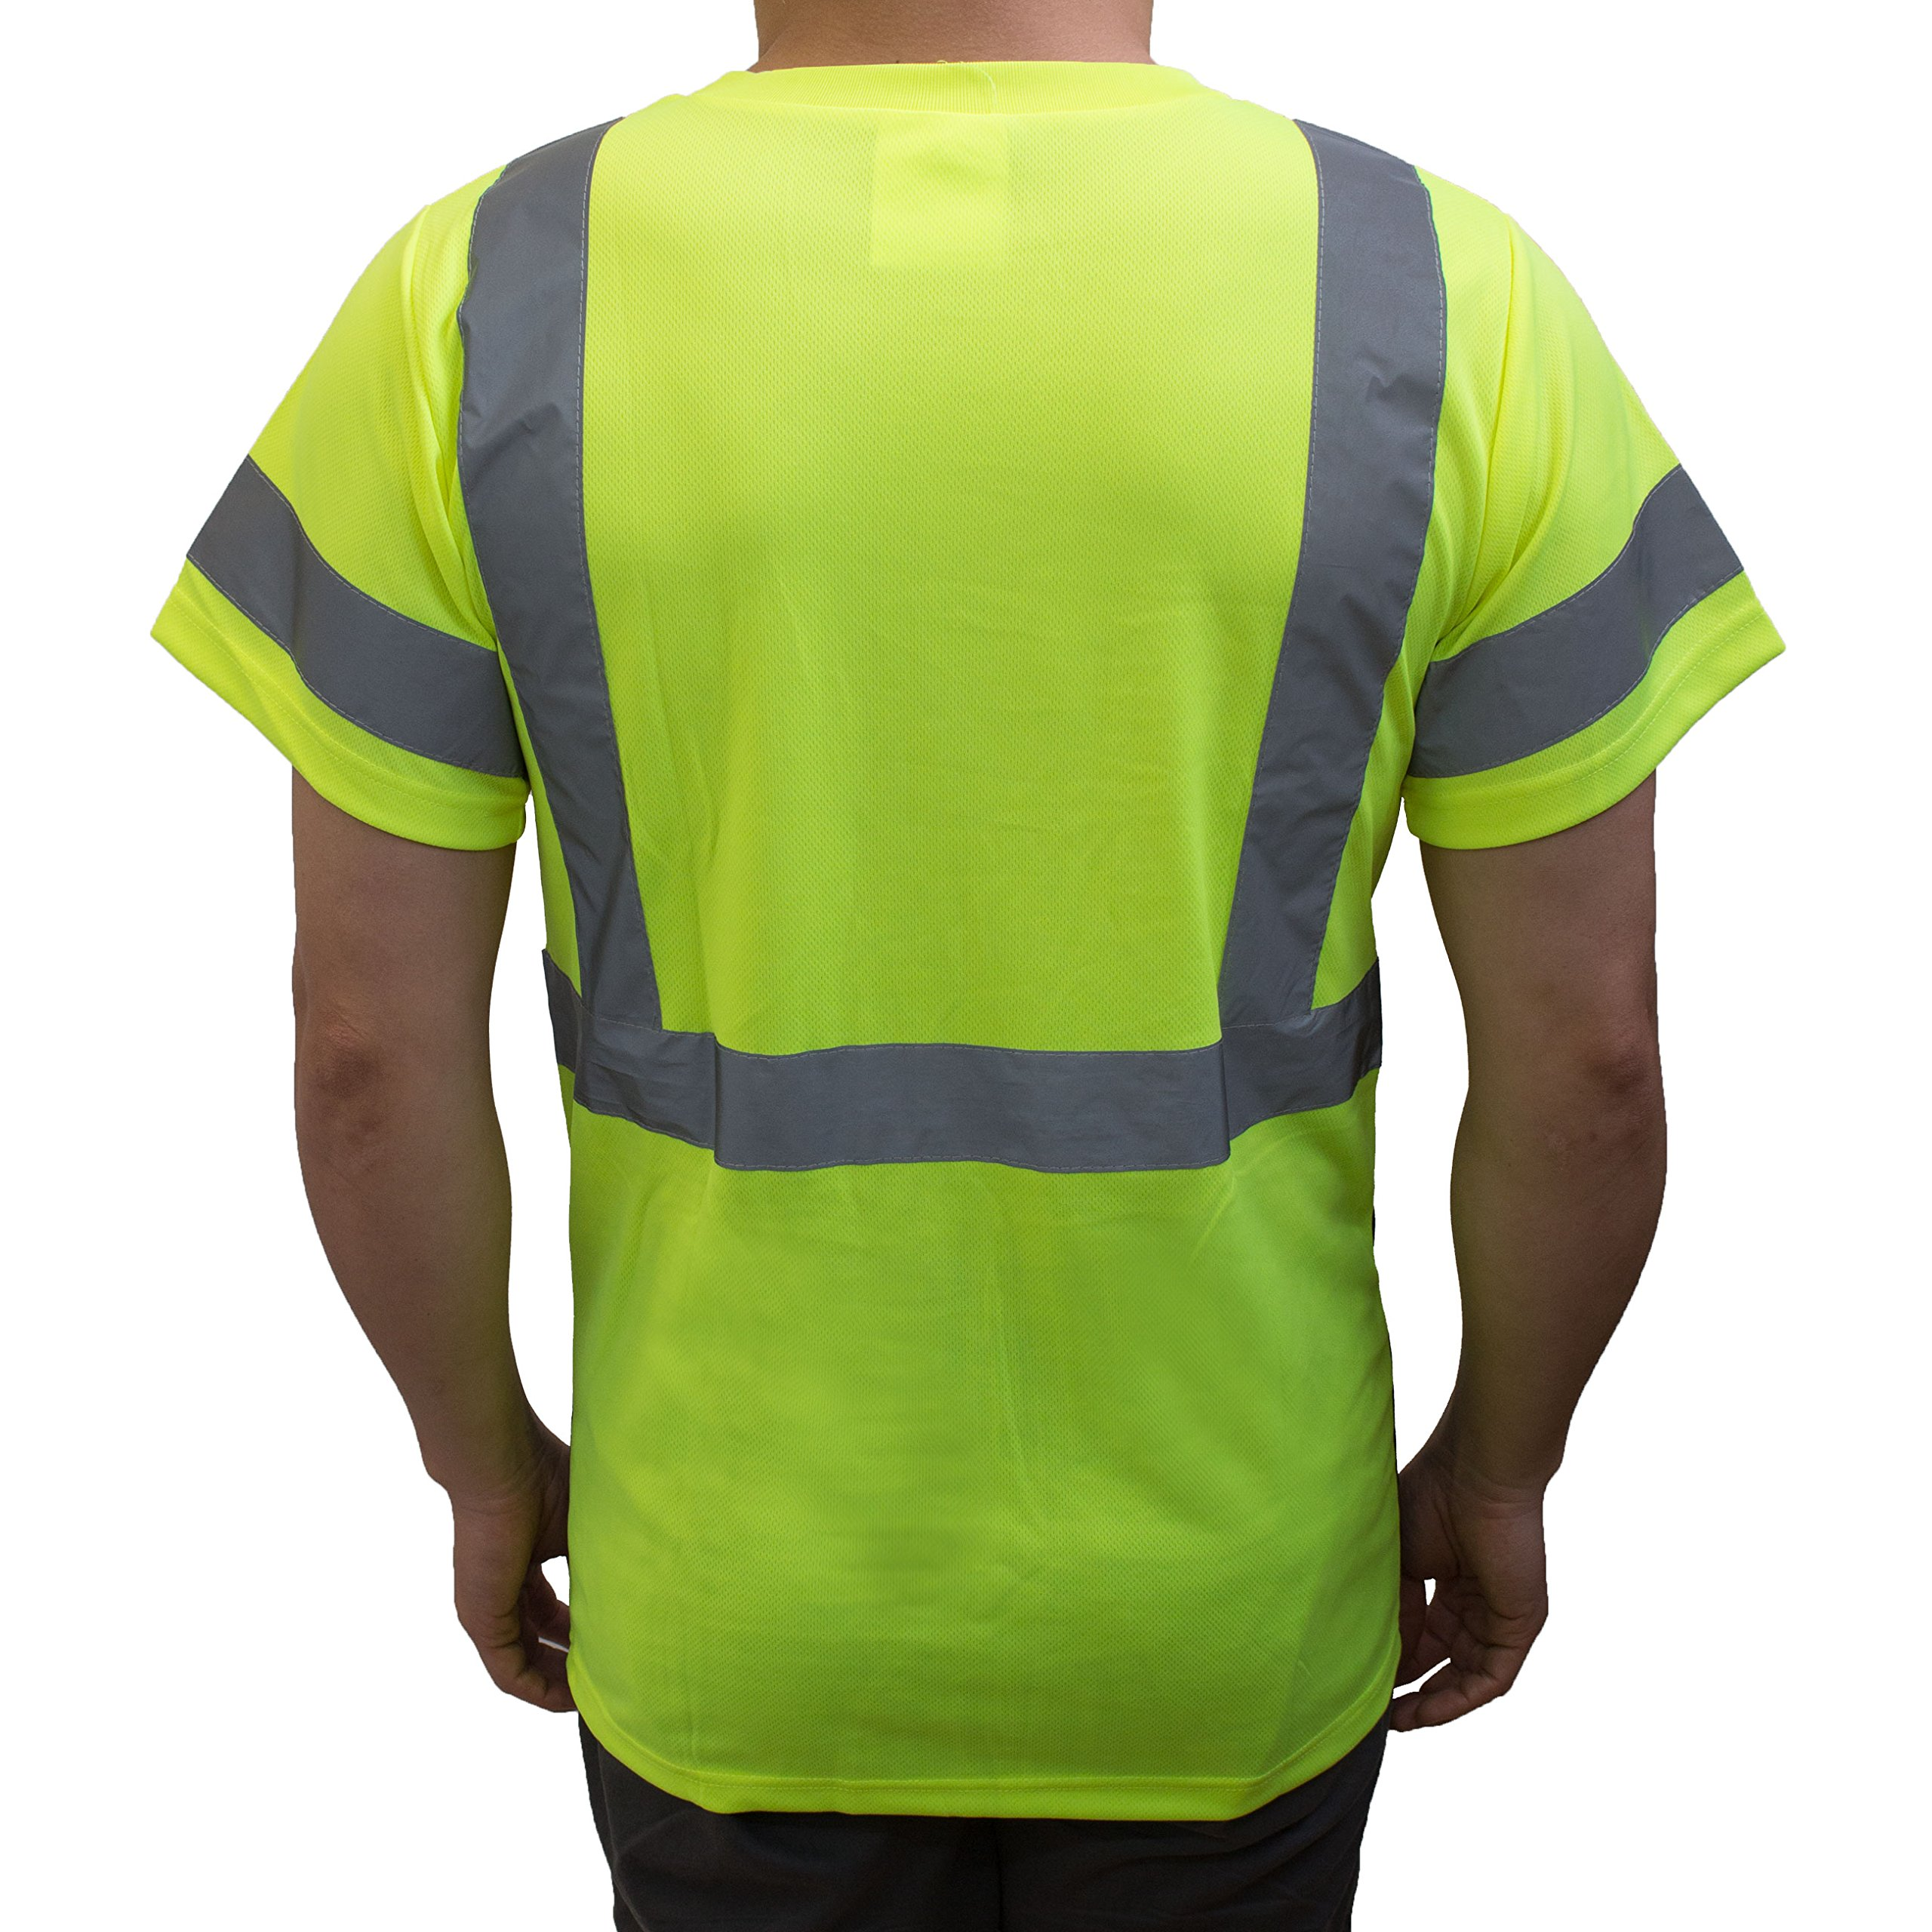 NY BFS8512 High-Visibility Class 3 T Shirt with Moisture Wicking Mesh Birdseye, Black Bottom (Large, Green) by New York Hi-Viz Workwear (Image #3)